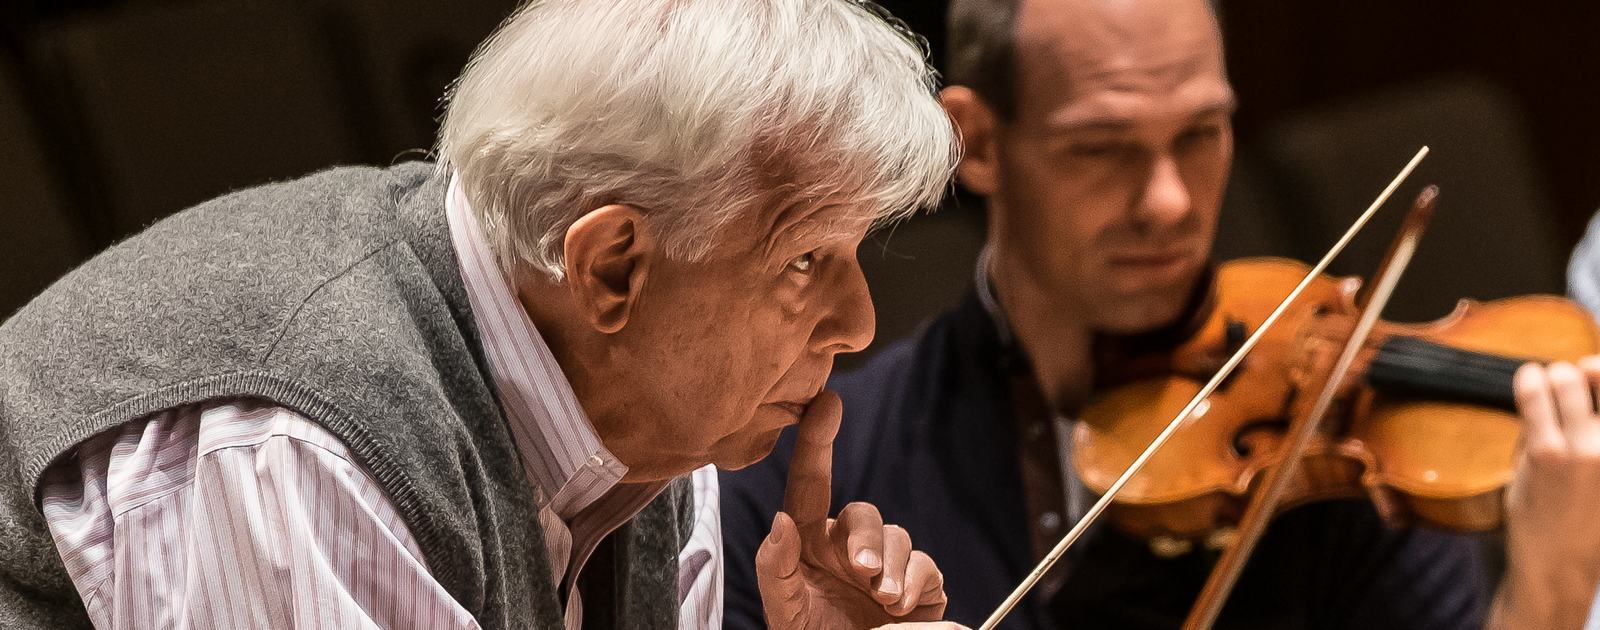 Christoph von Dohnányi - conductor;.Carolin Widmann - violin;.Philharmonia Orchestra; .Royal Festival Hall;.London, UK;.1 October 2015;..Berg violin concerto;.Schubert Symphony No 9 in C major;..Credit: © CLIVE BARDA/ ArenaPAL;